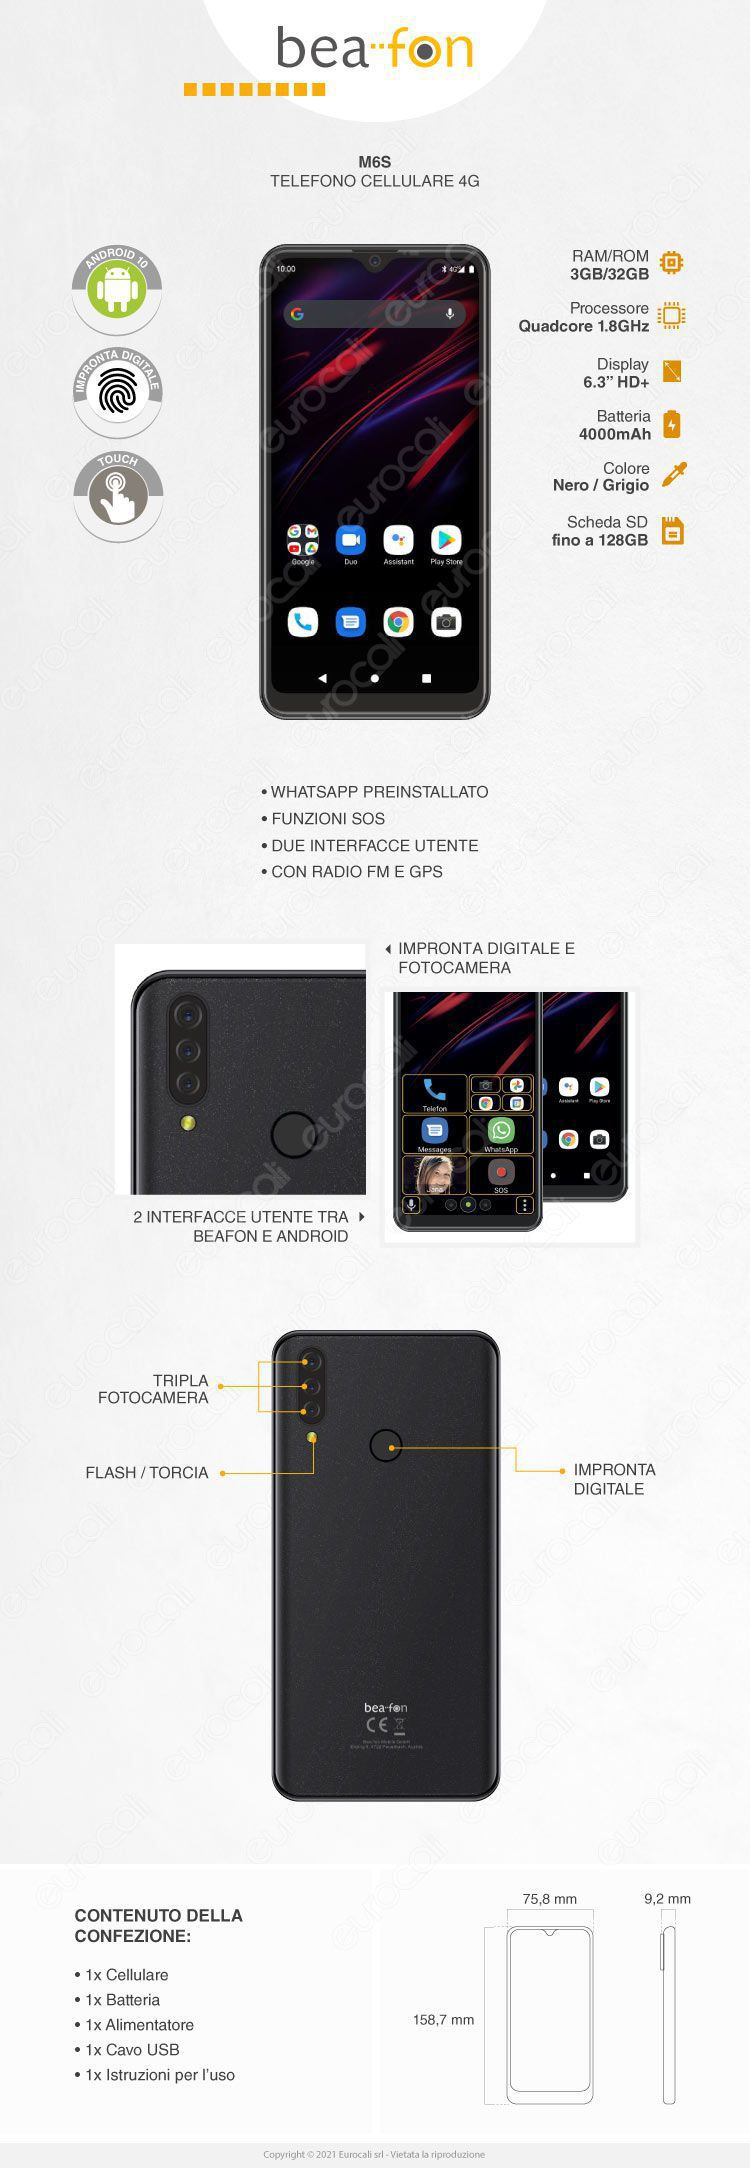 smartphone M6s Beafon